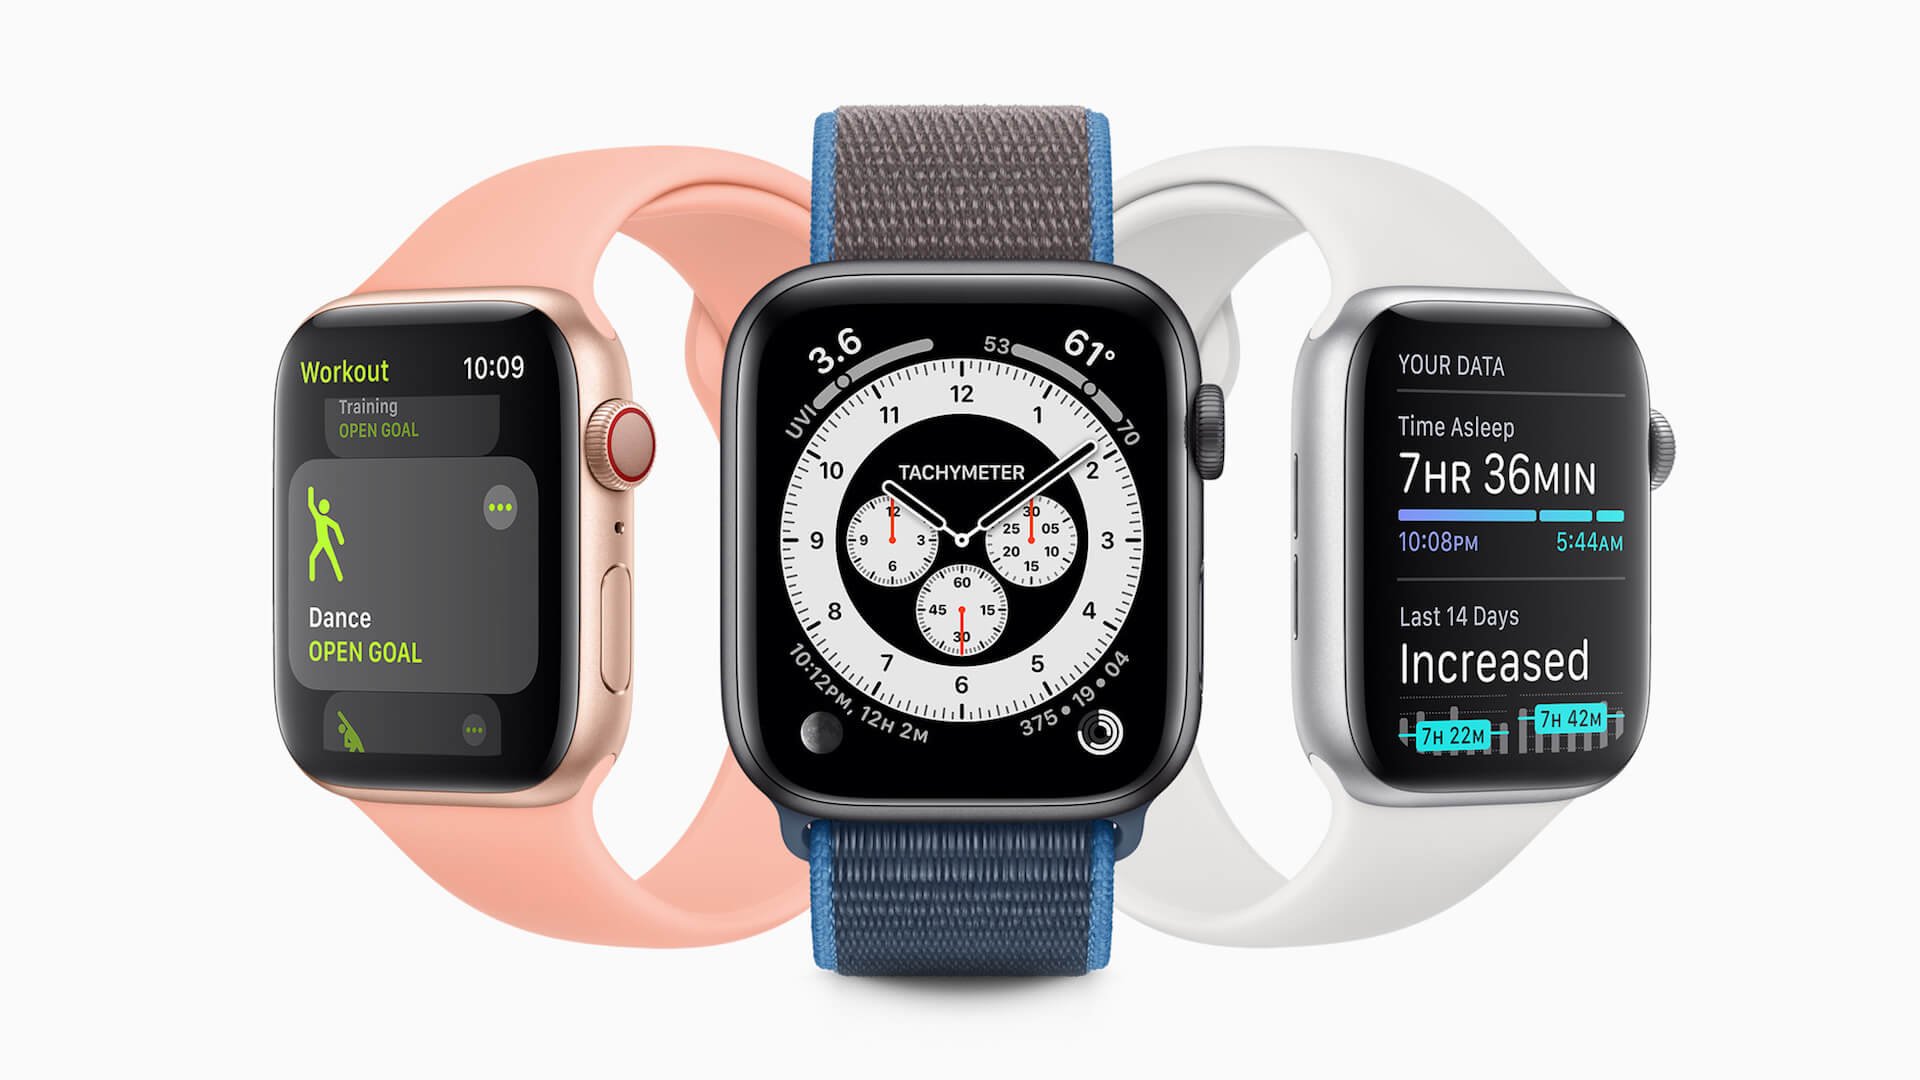 Apple Watchの廉価版は今週発表?Series 5に高度計を搭載したモデルとして登場か tech200914_applewatch_1